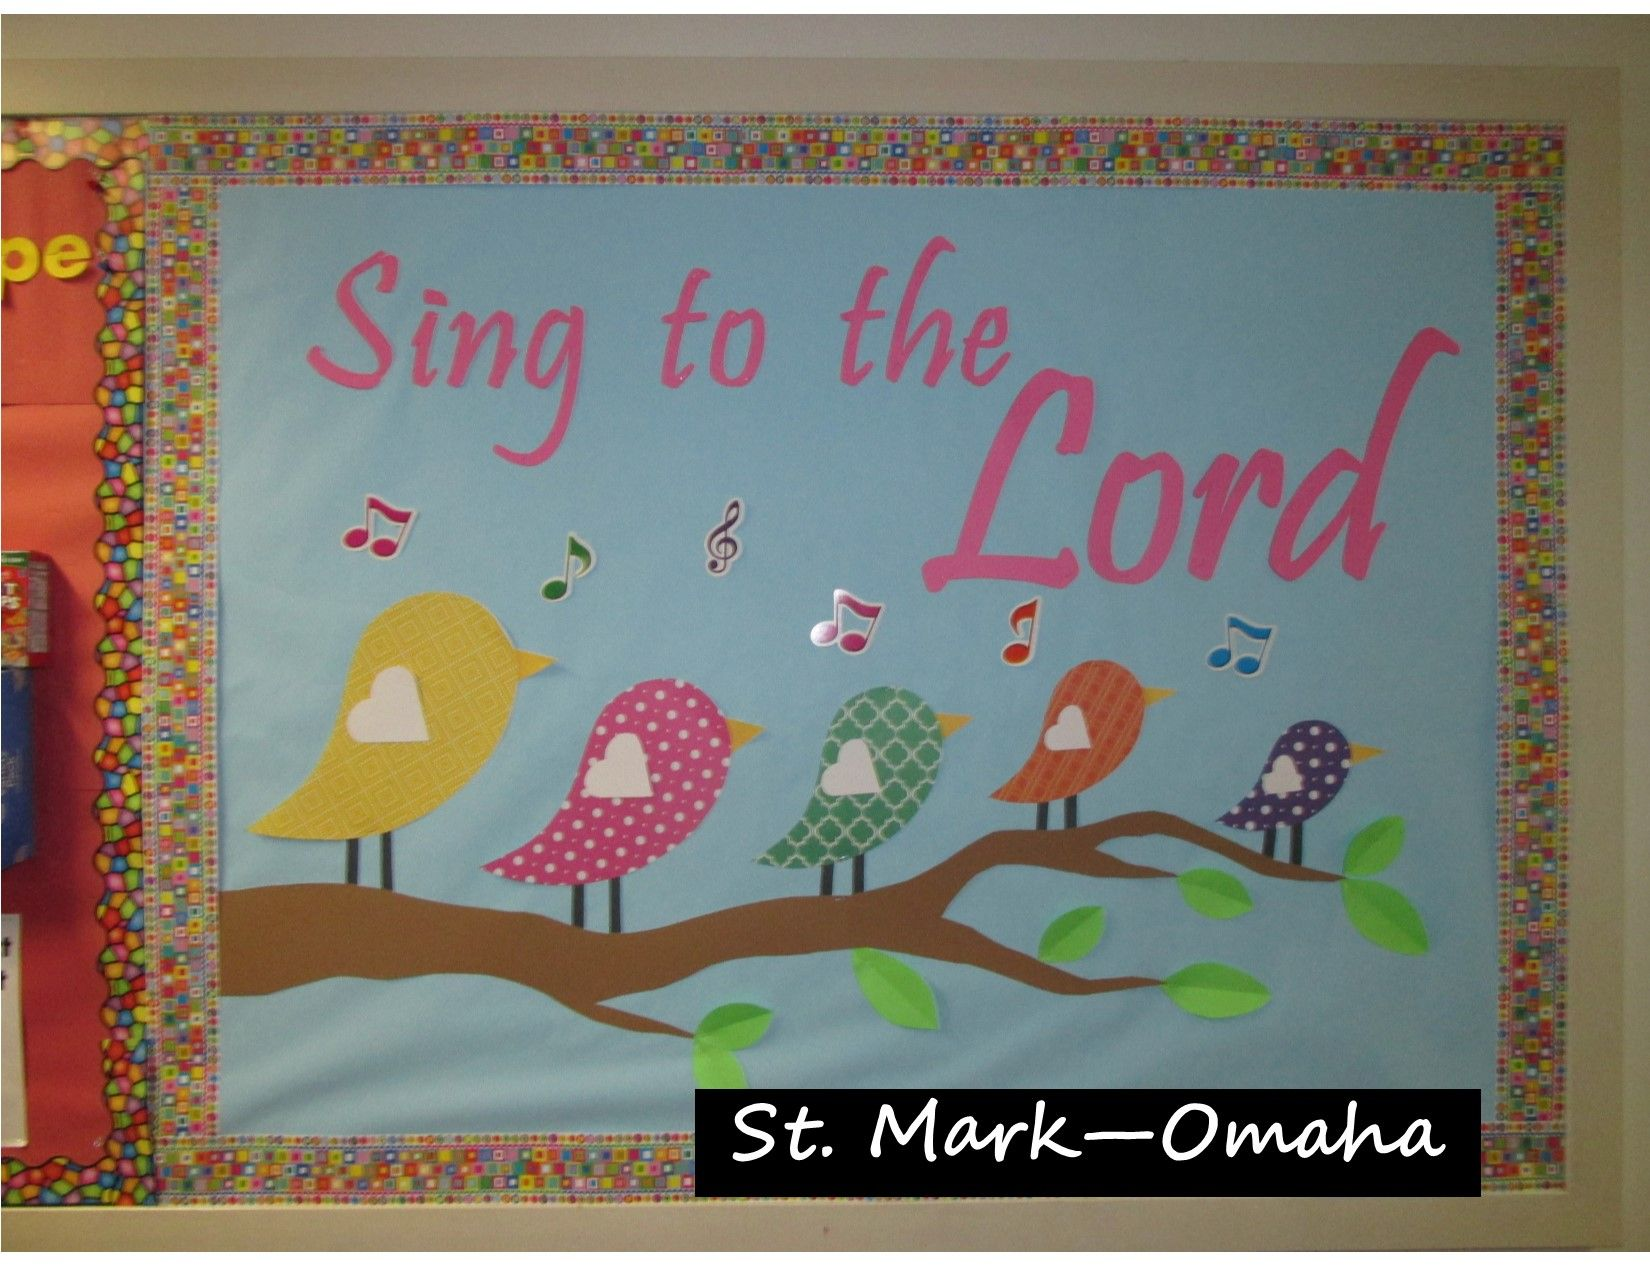 Sunday School Bulletin Board A Nice Musical Themed One For Spring Christian Boards Preschool Summer